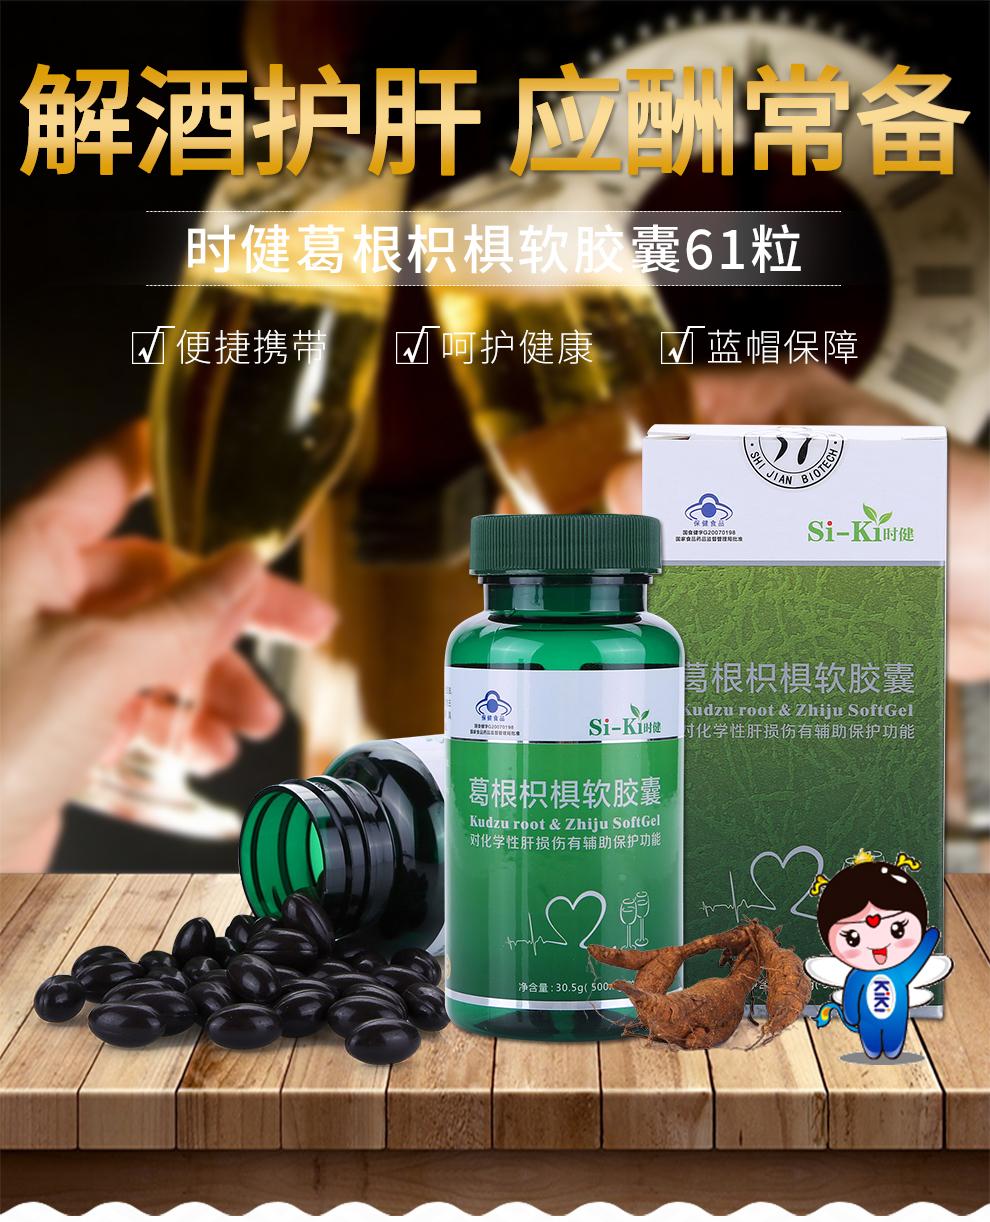 C描述_00_解酒醒酒体验装1瓶送多种维生素加矿物质0001